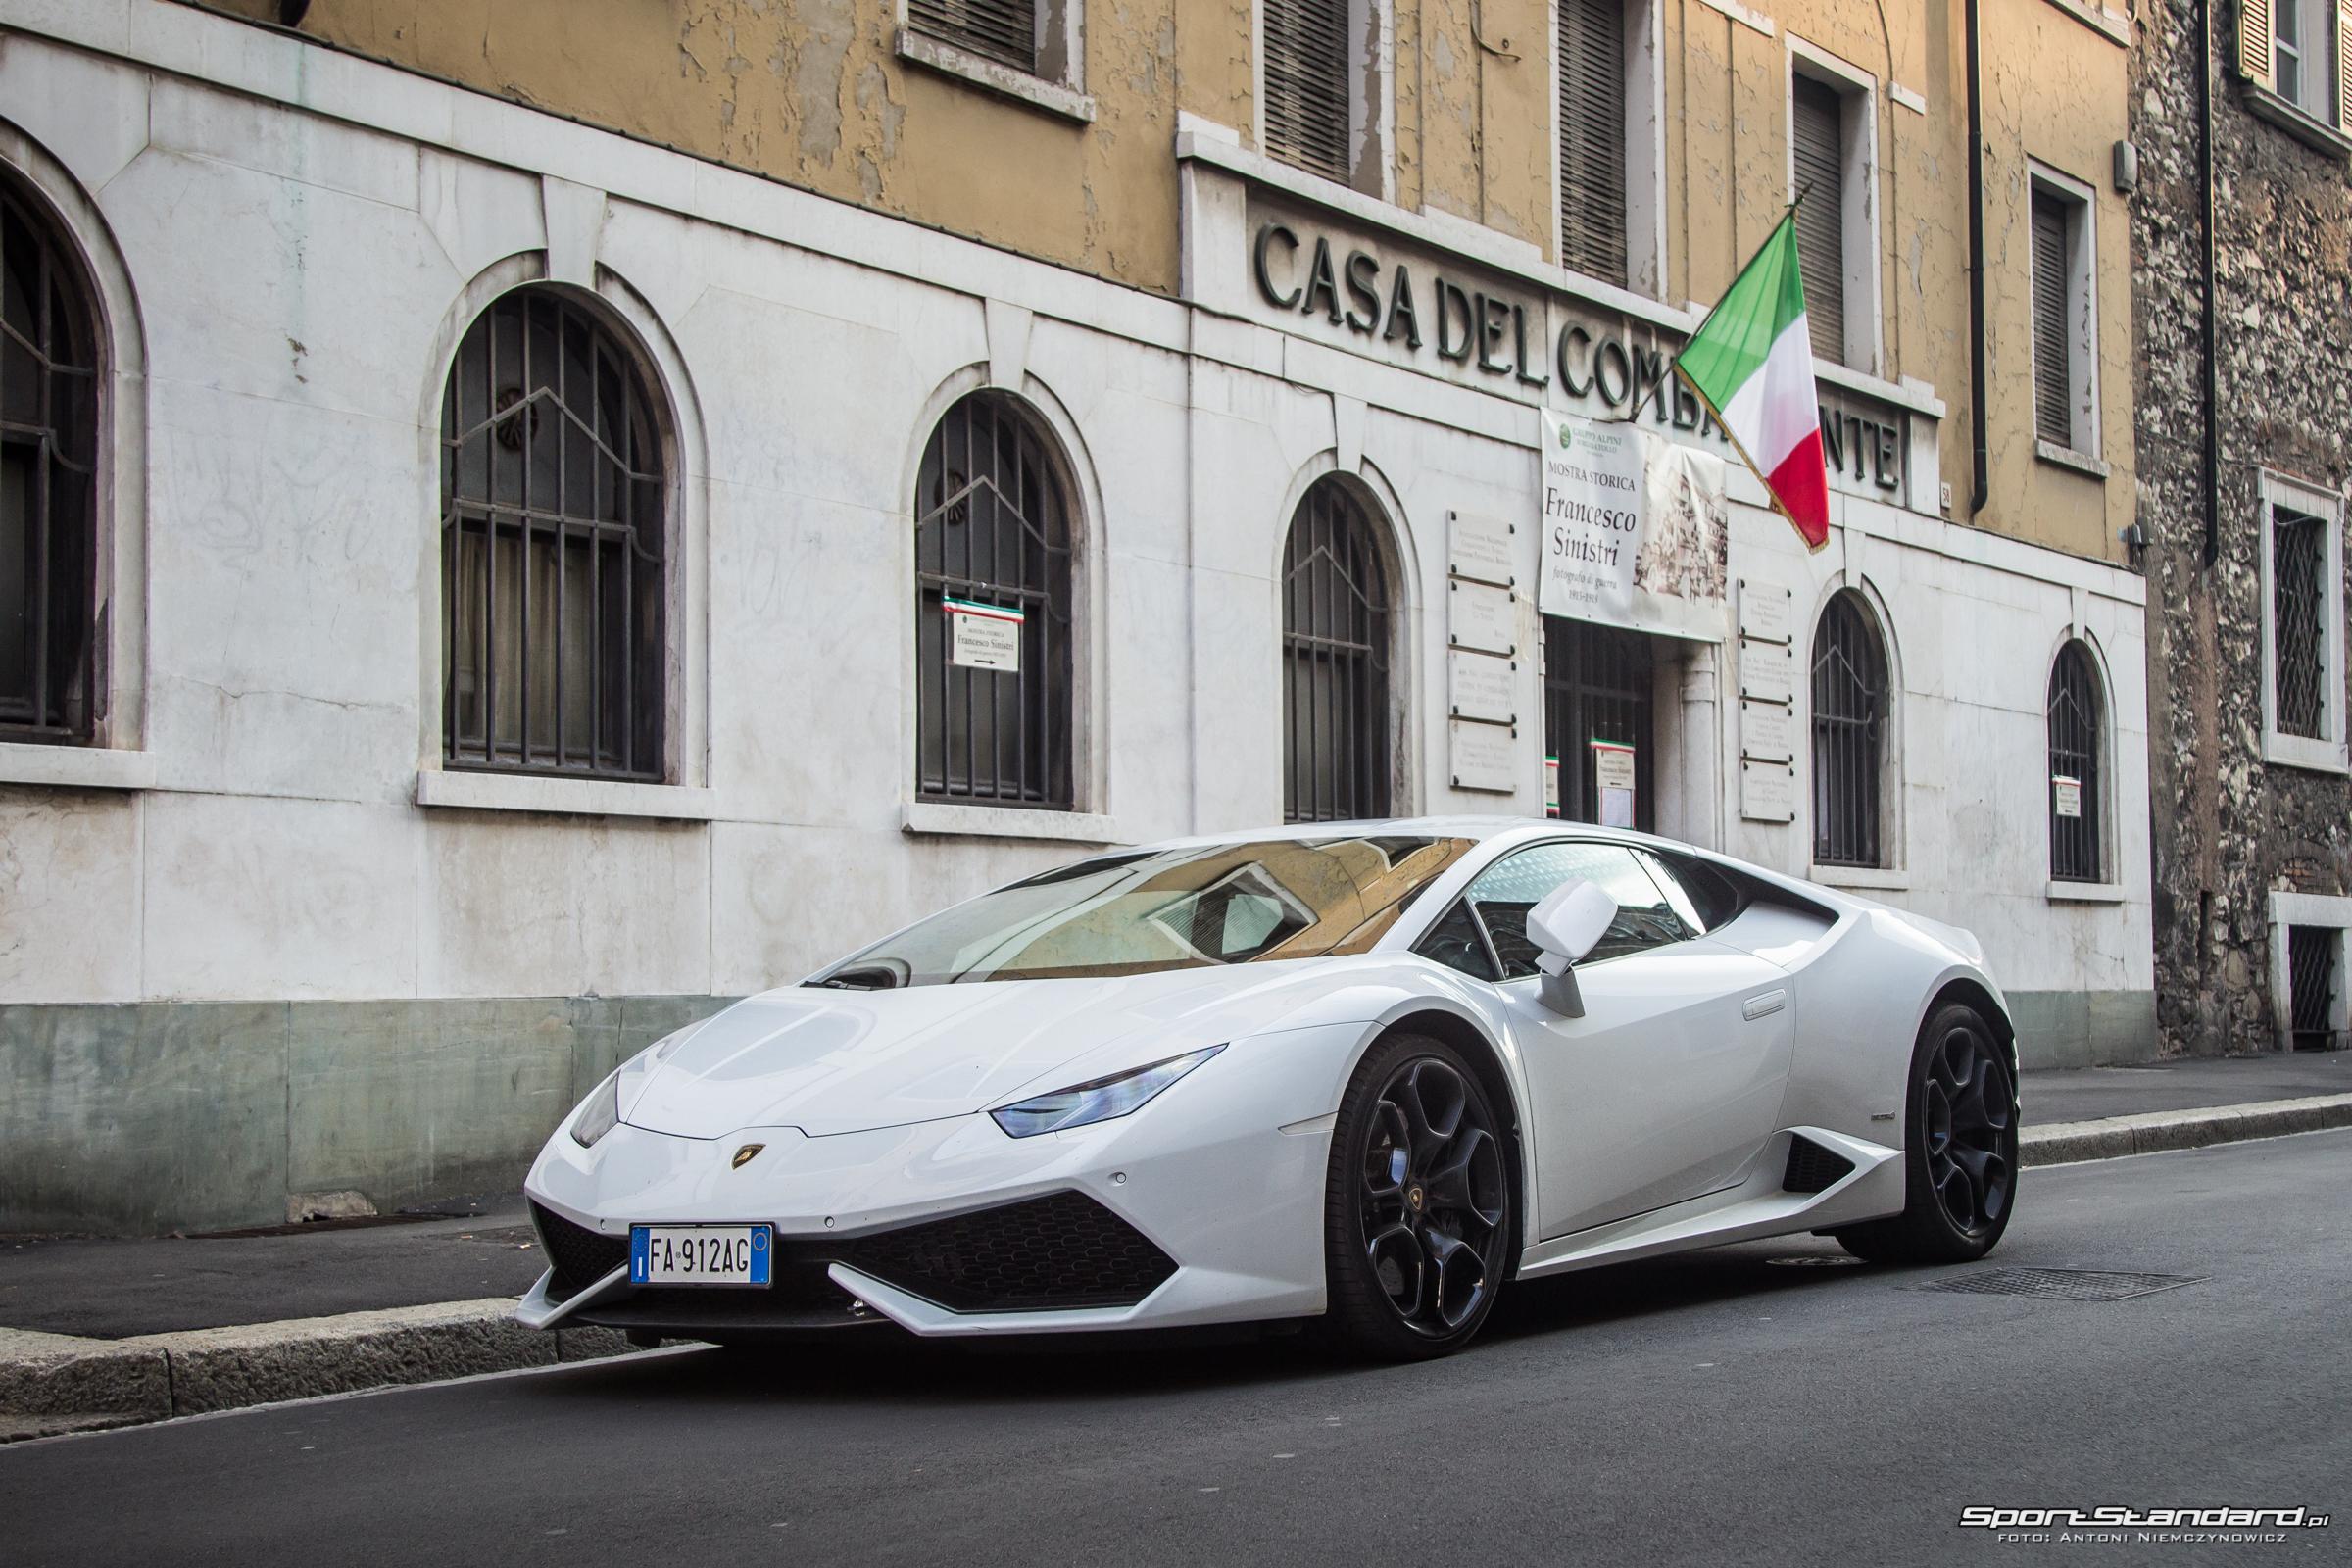 Wallpaper_Lamborghini_Huracan_Brescia_SportStandard-2